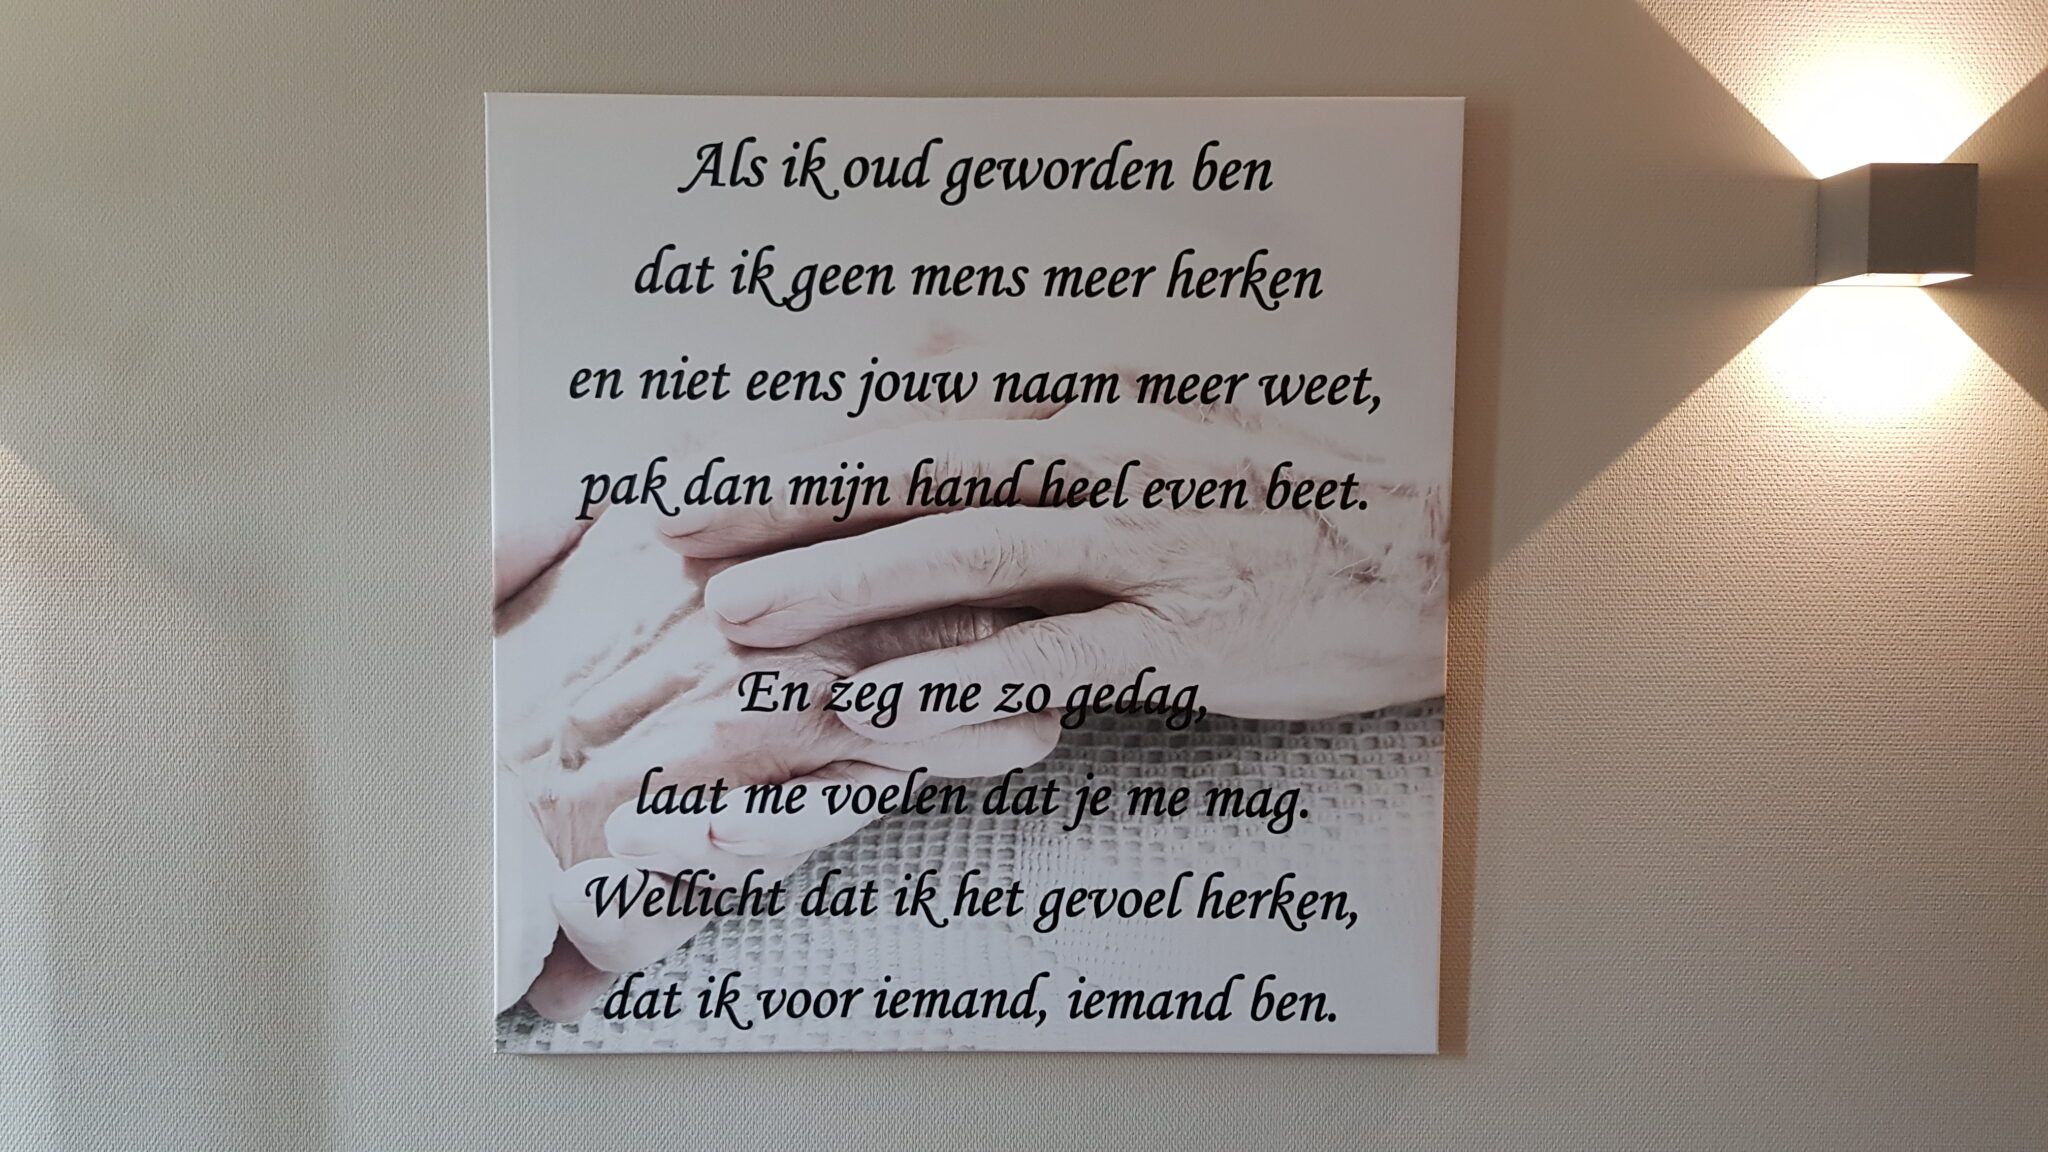 Hurkhuis 001